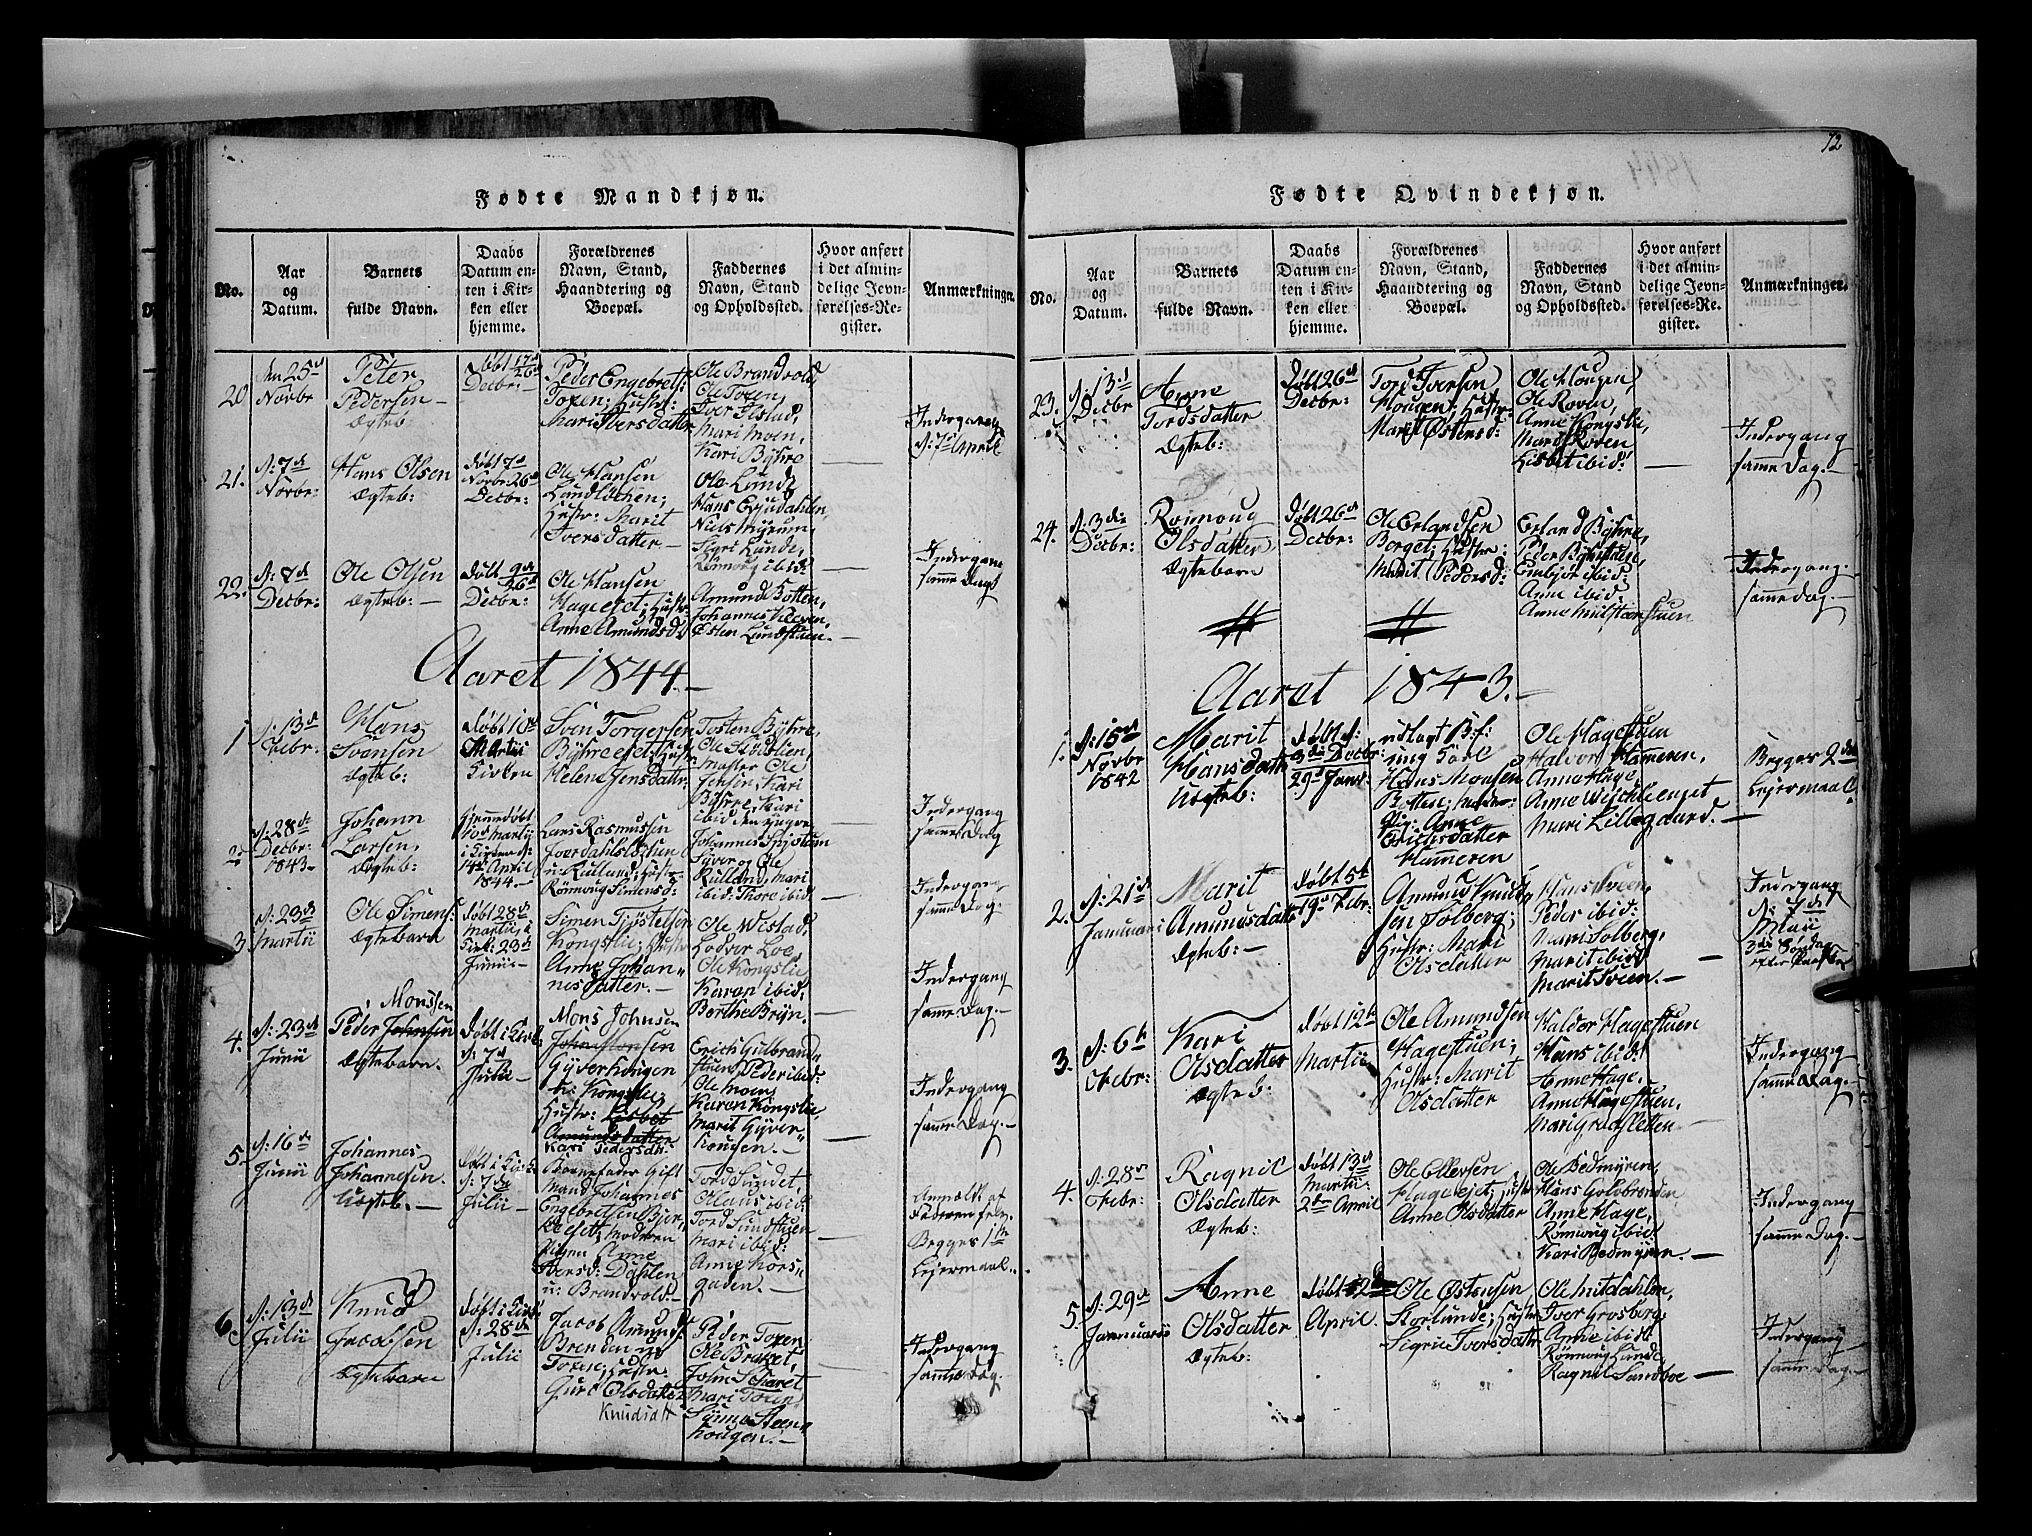 SAH, Fron prestekontor, H/Ha/Hab/L0004: Klokkerbok nr. 4, 1816-1850, s. 72